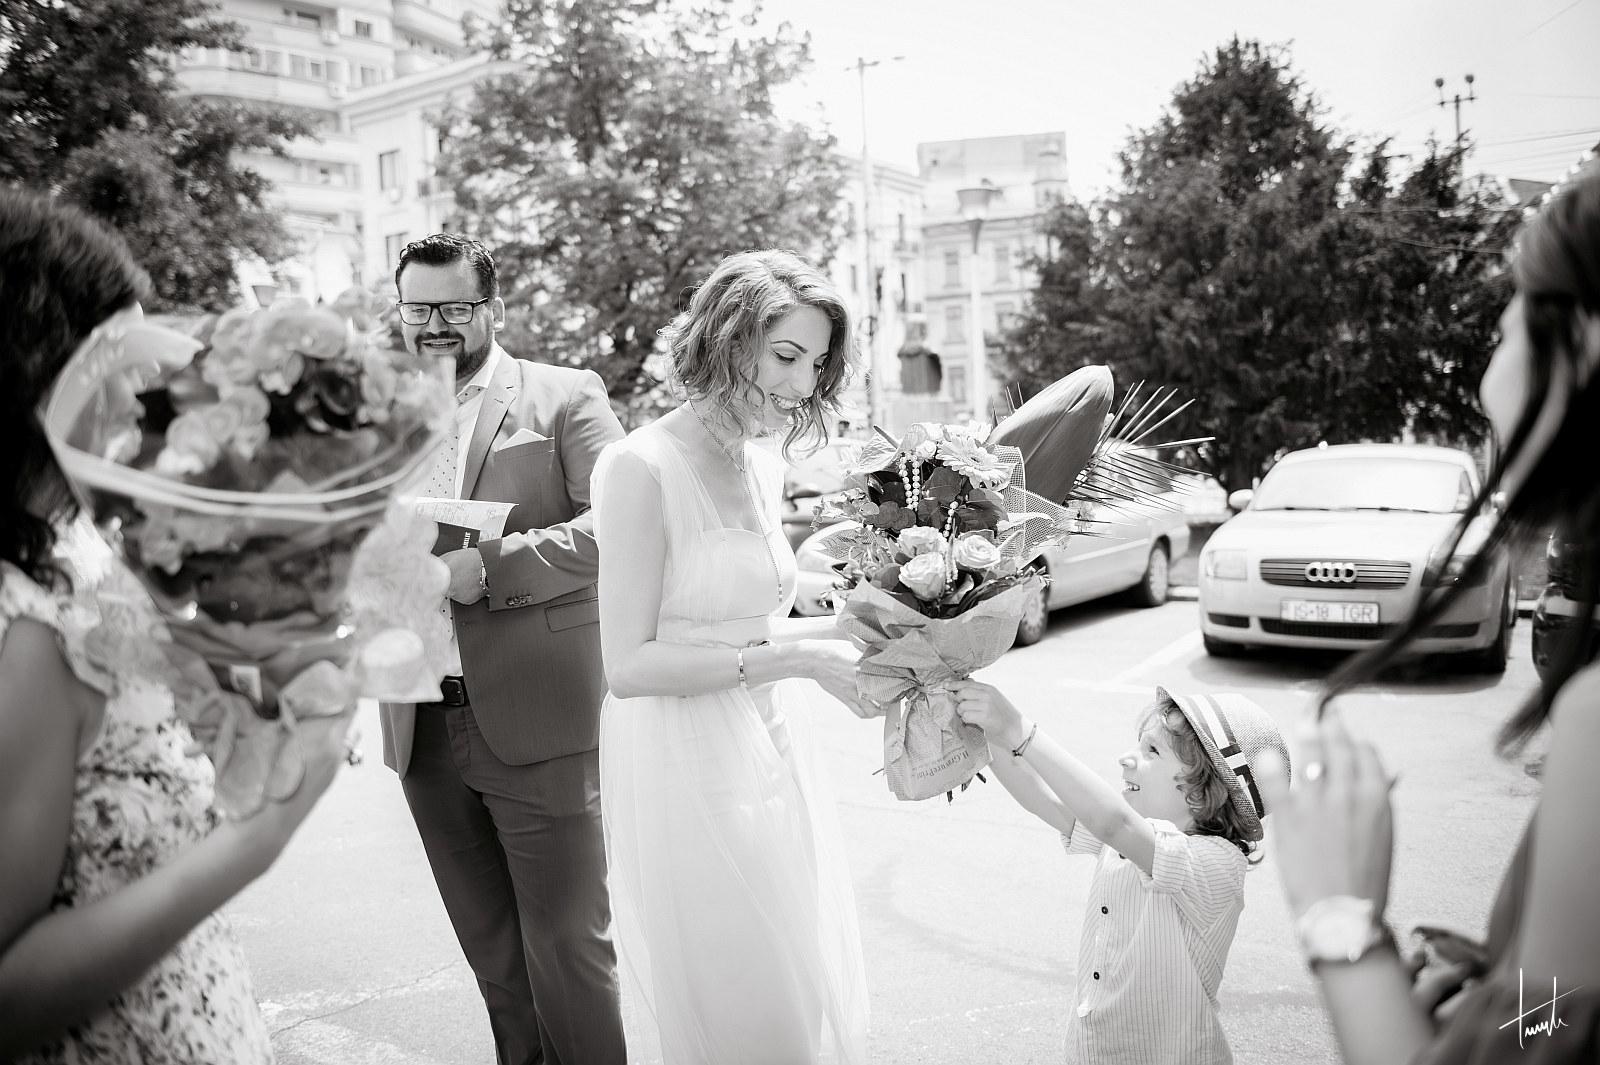 fotografie de nunta - Alina Mircea - by Bogdan Terente 10